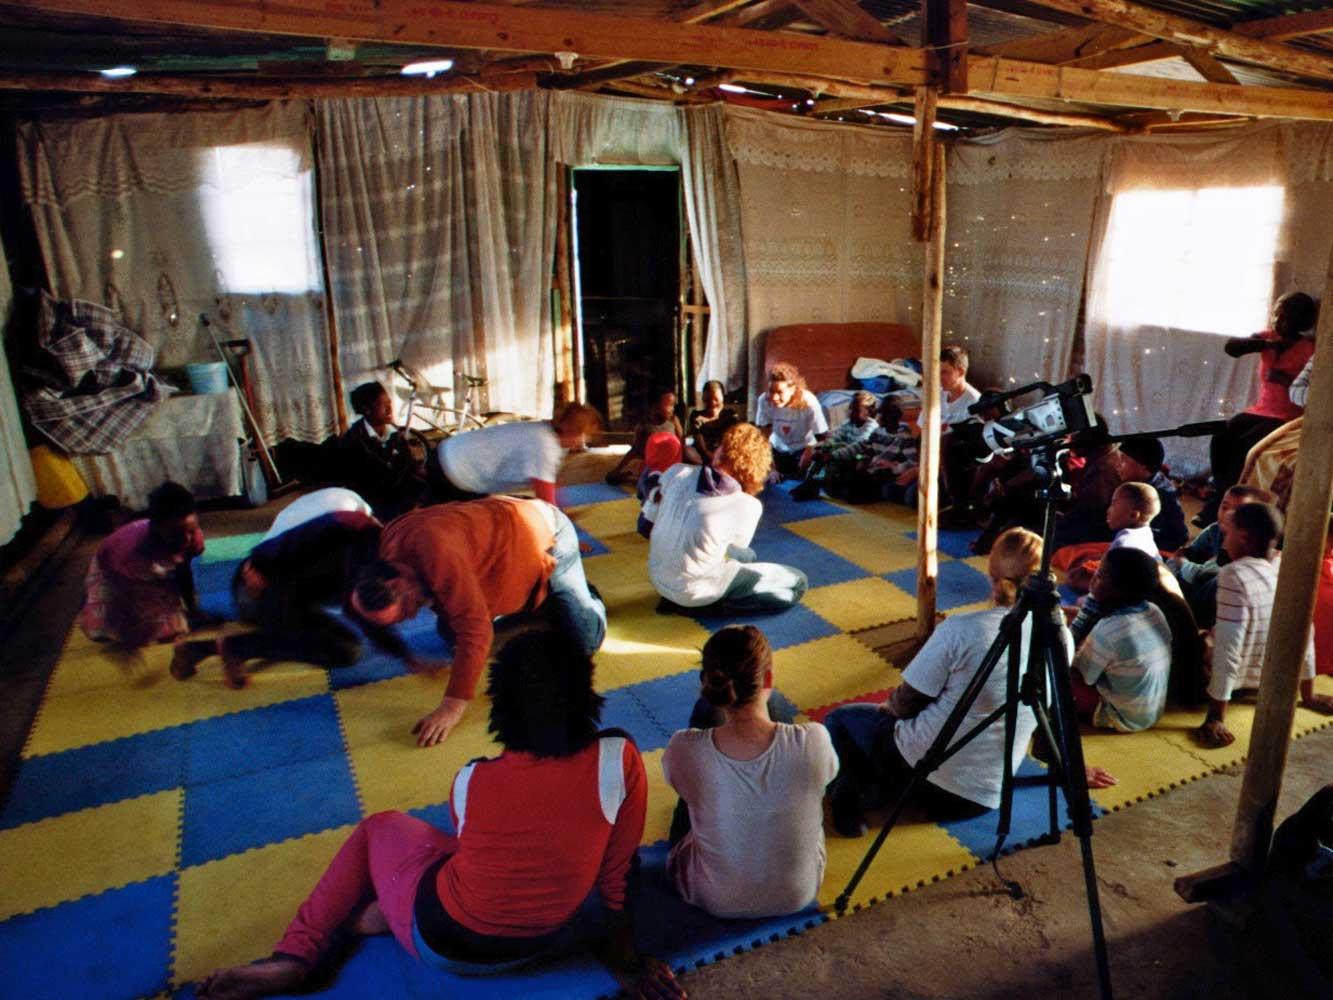 Original Play in einem Flüchtlingscamp, Johannesburg, Südafrika, 2012